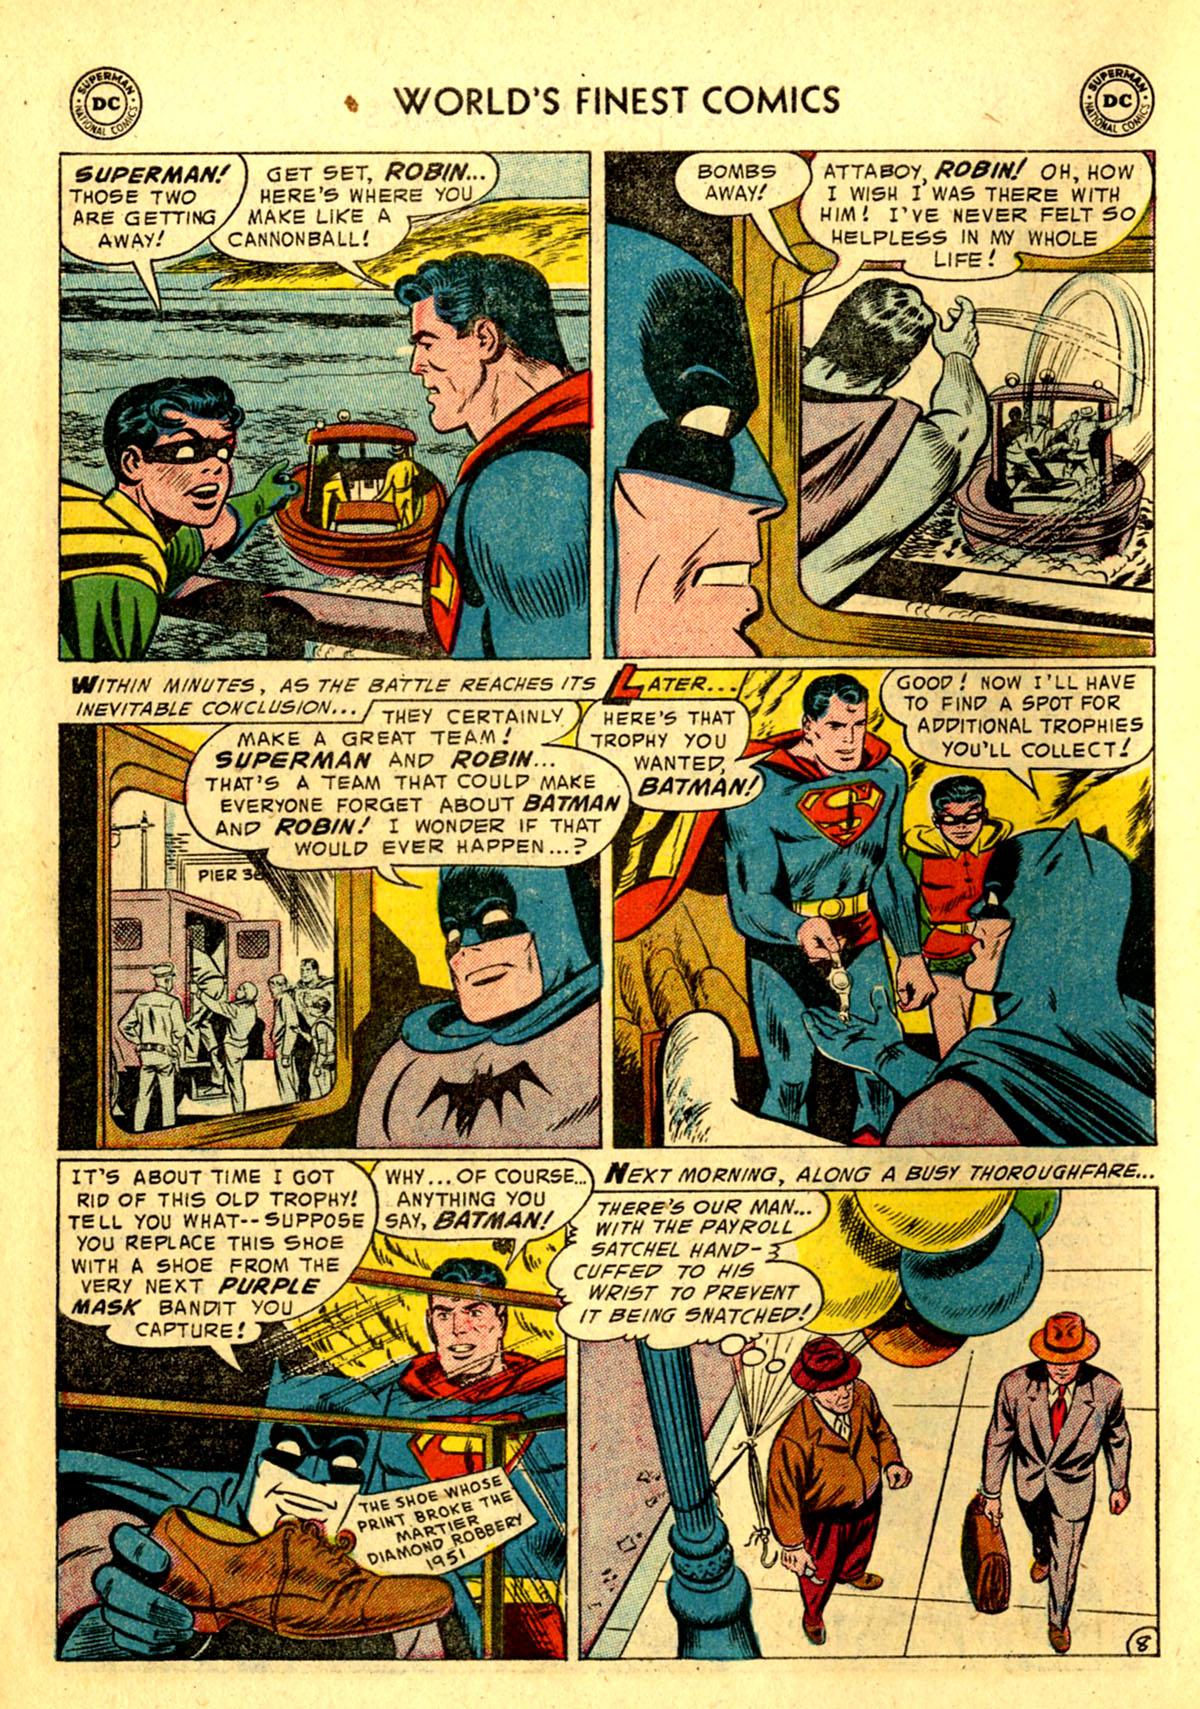 Read online World's Finest Comics comic -  Issue #75 - 10